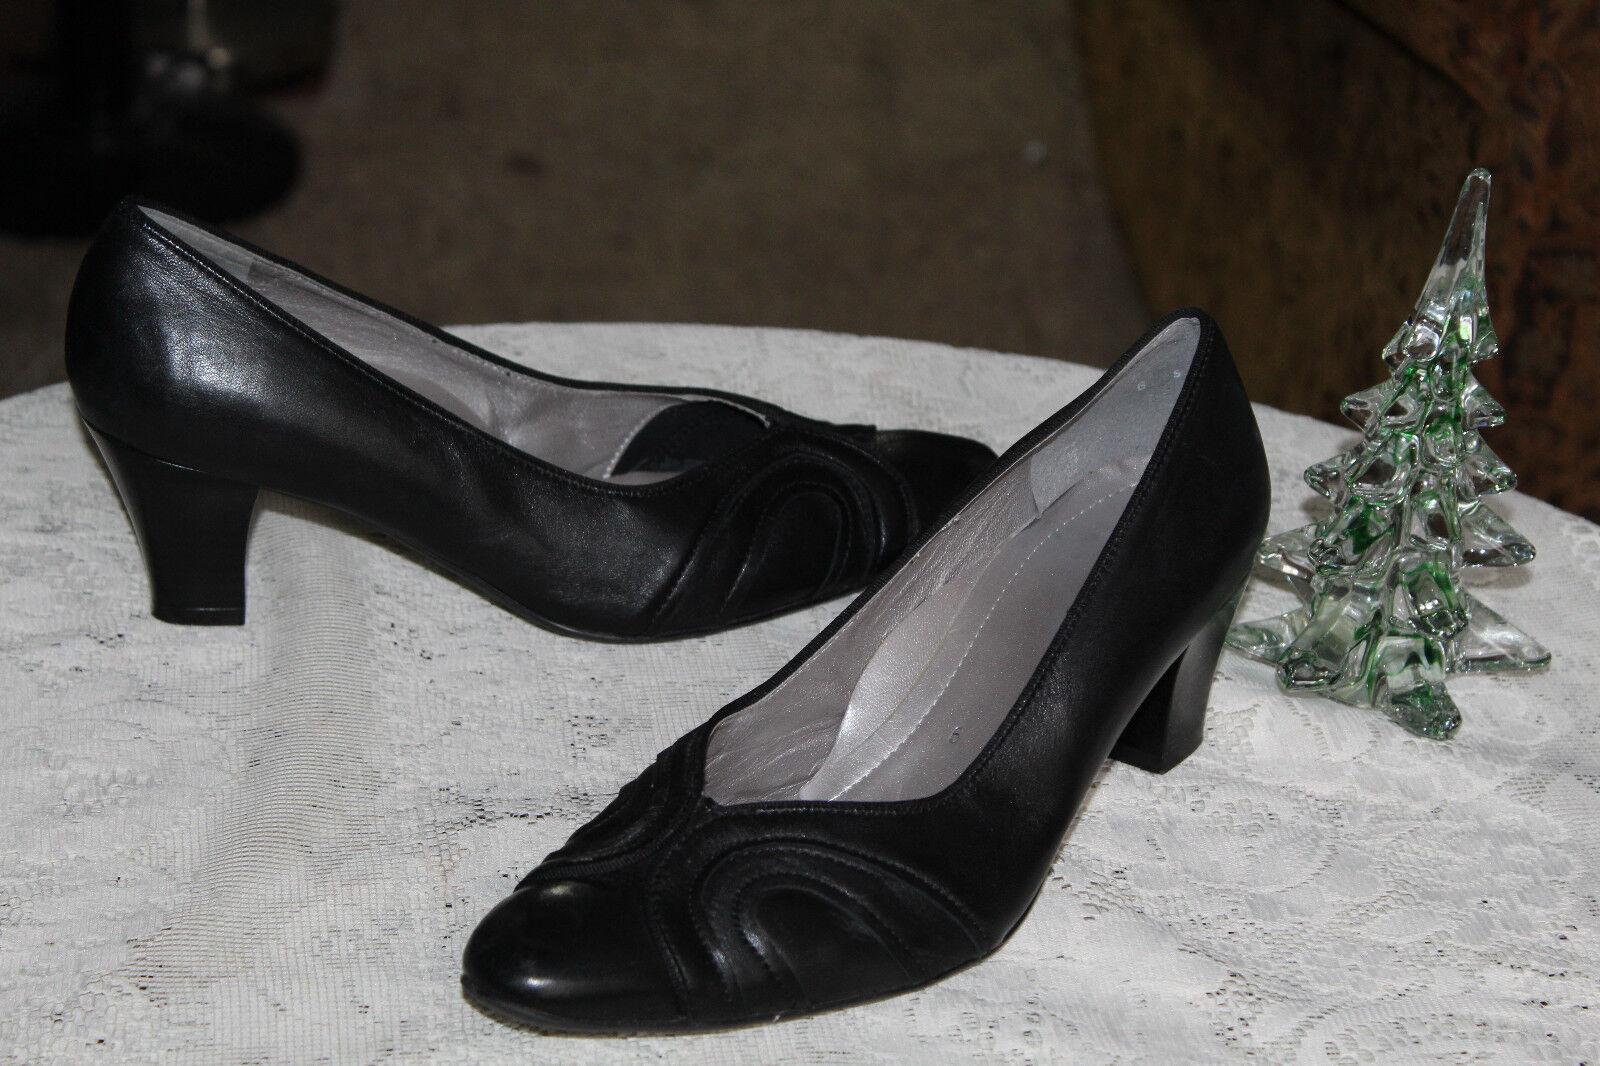 Hermoso Hermoso Hermoso Vestido De Cuero Negro  Ara Talón bombas 6G.  179  perfecto